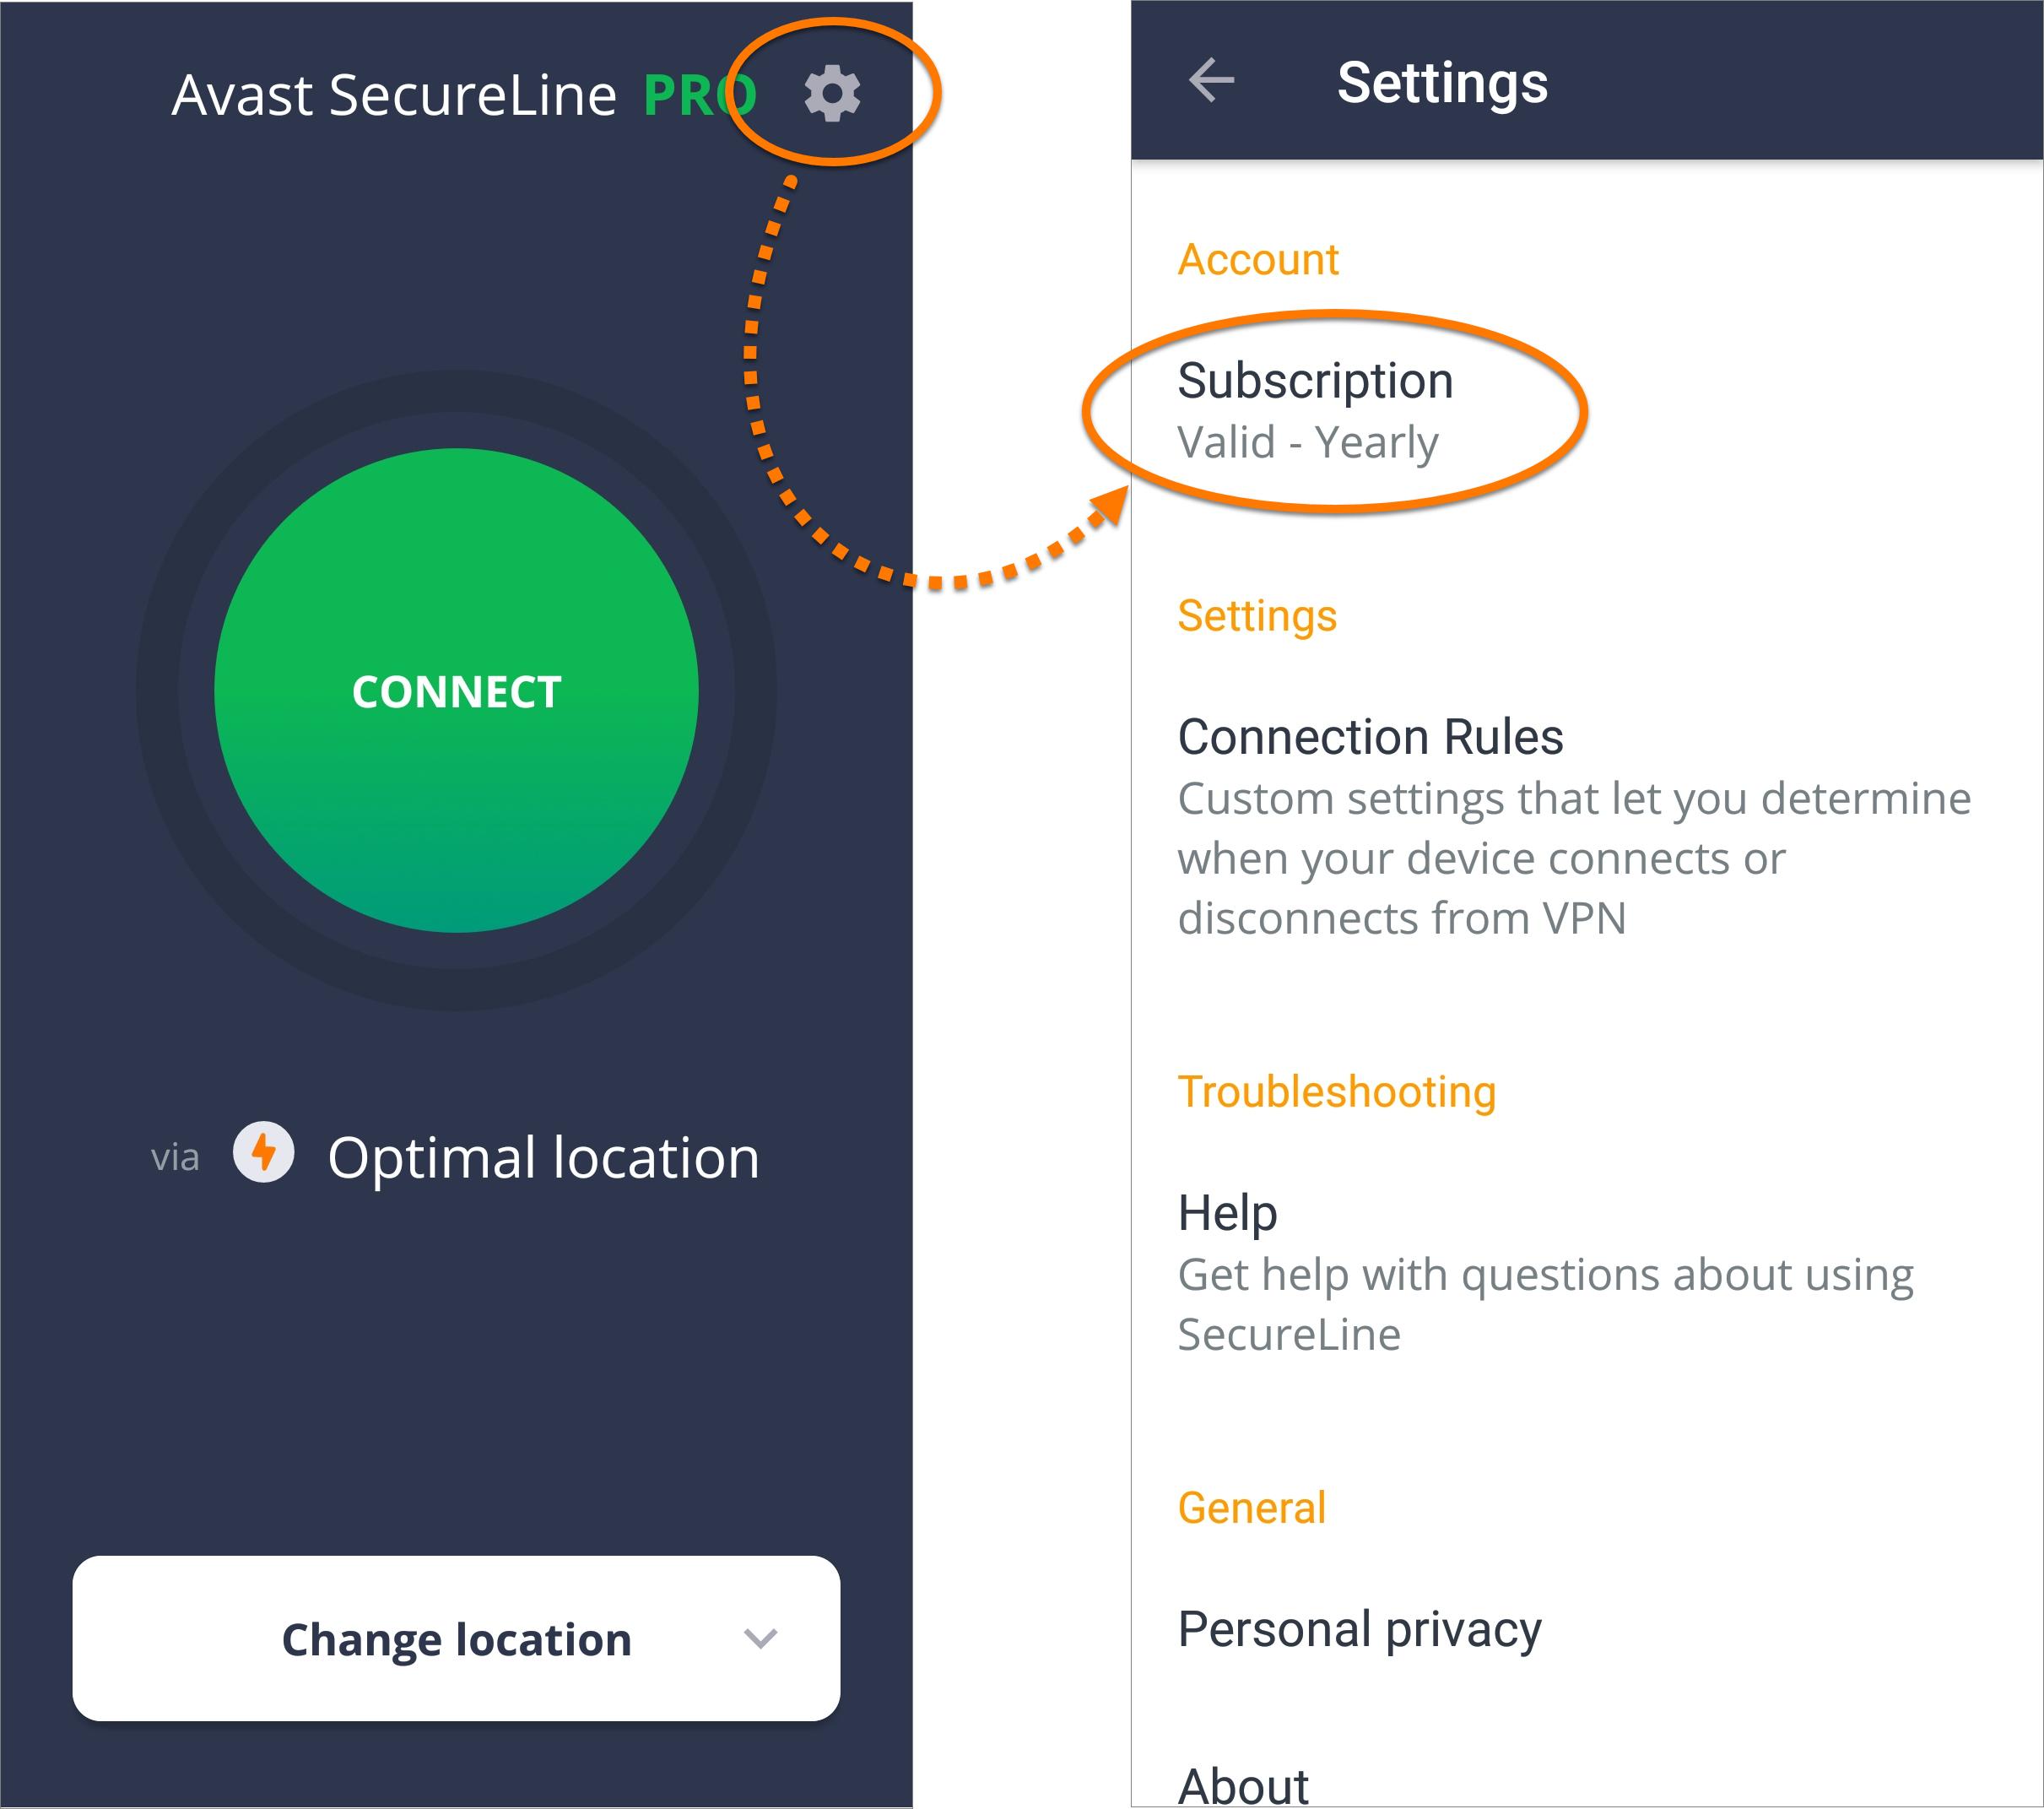 Avast secureline free code | Avast Secureline VPN License ...